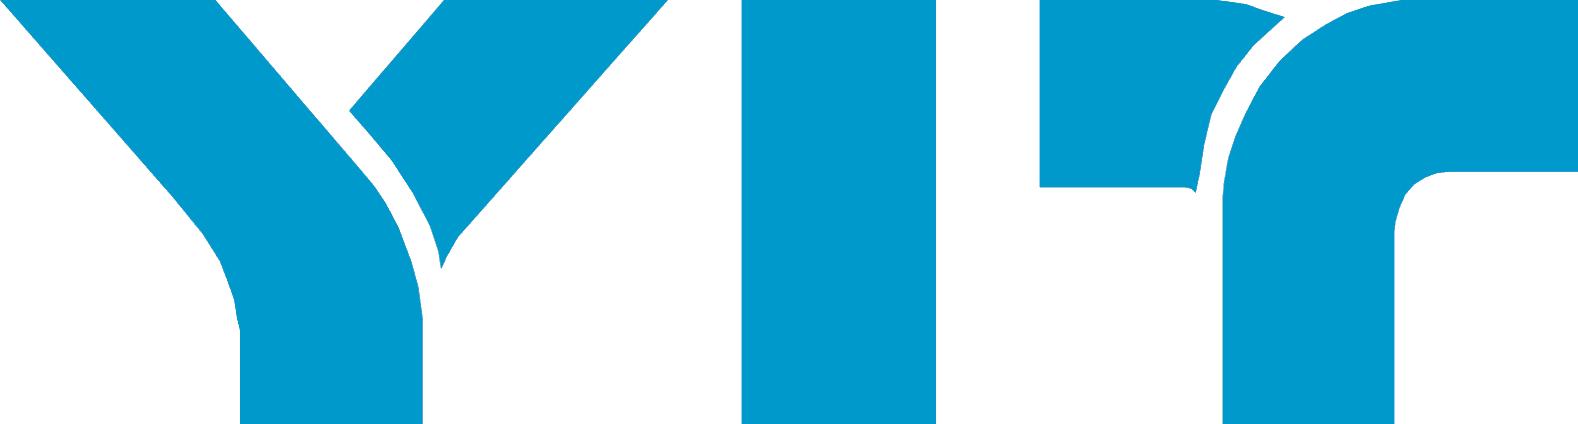 Компания YIT